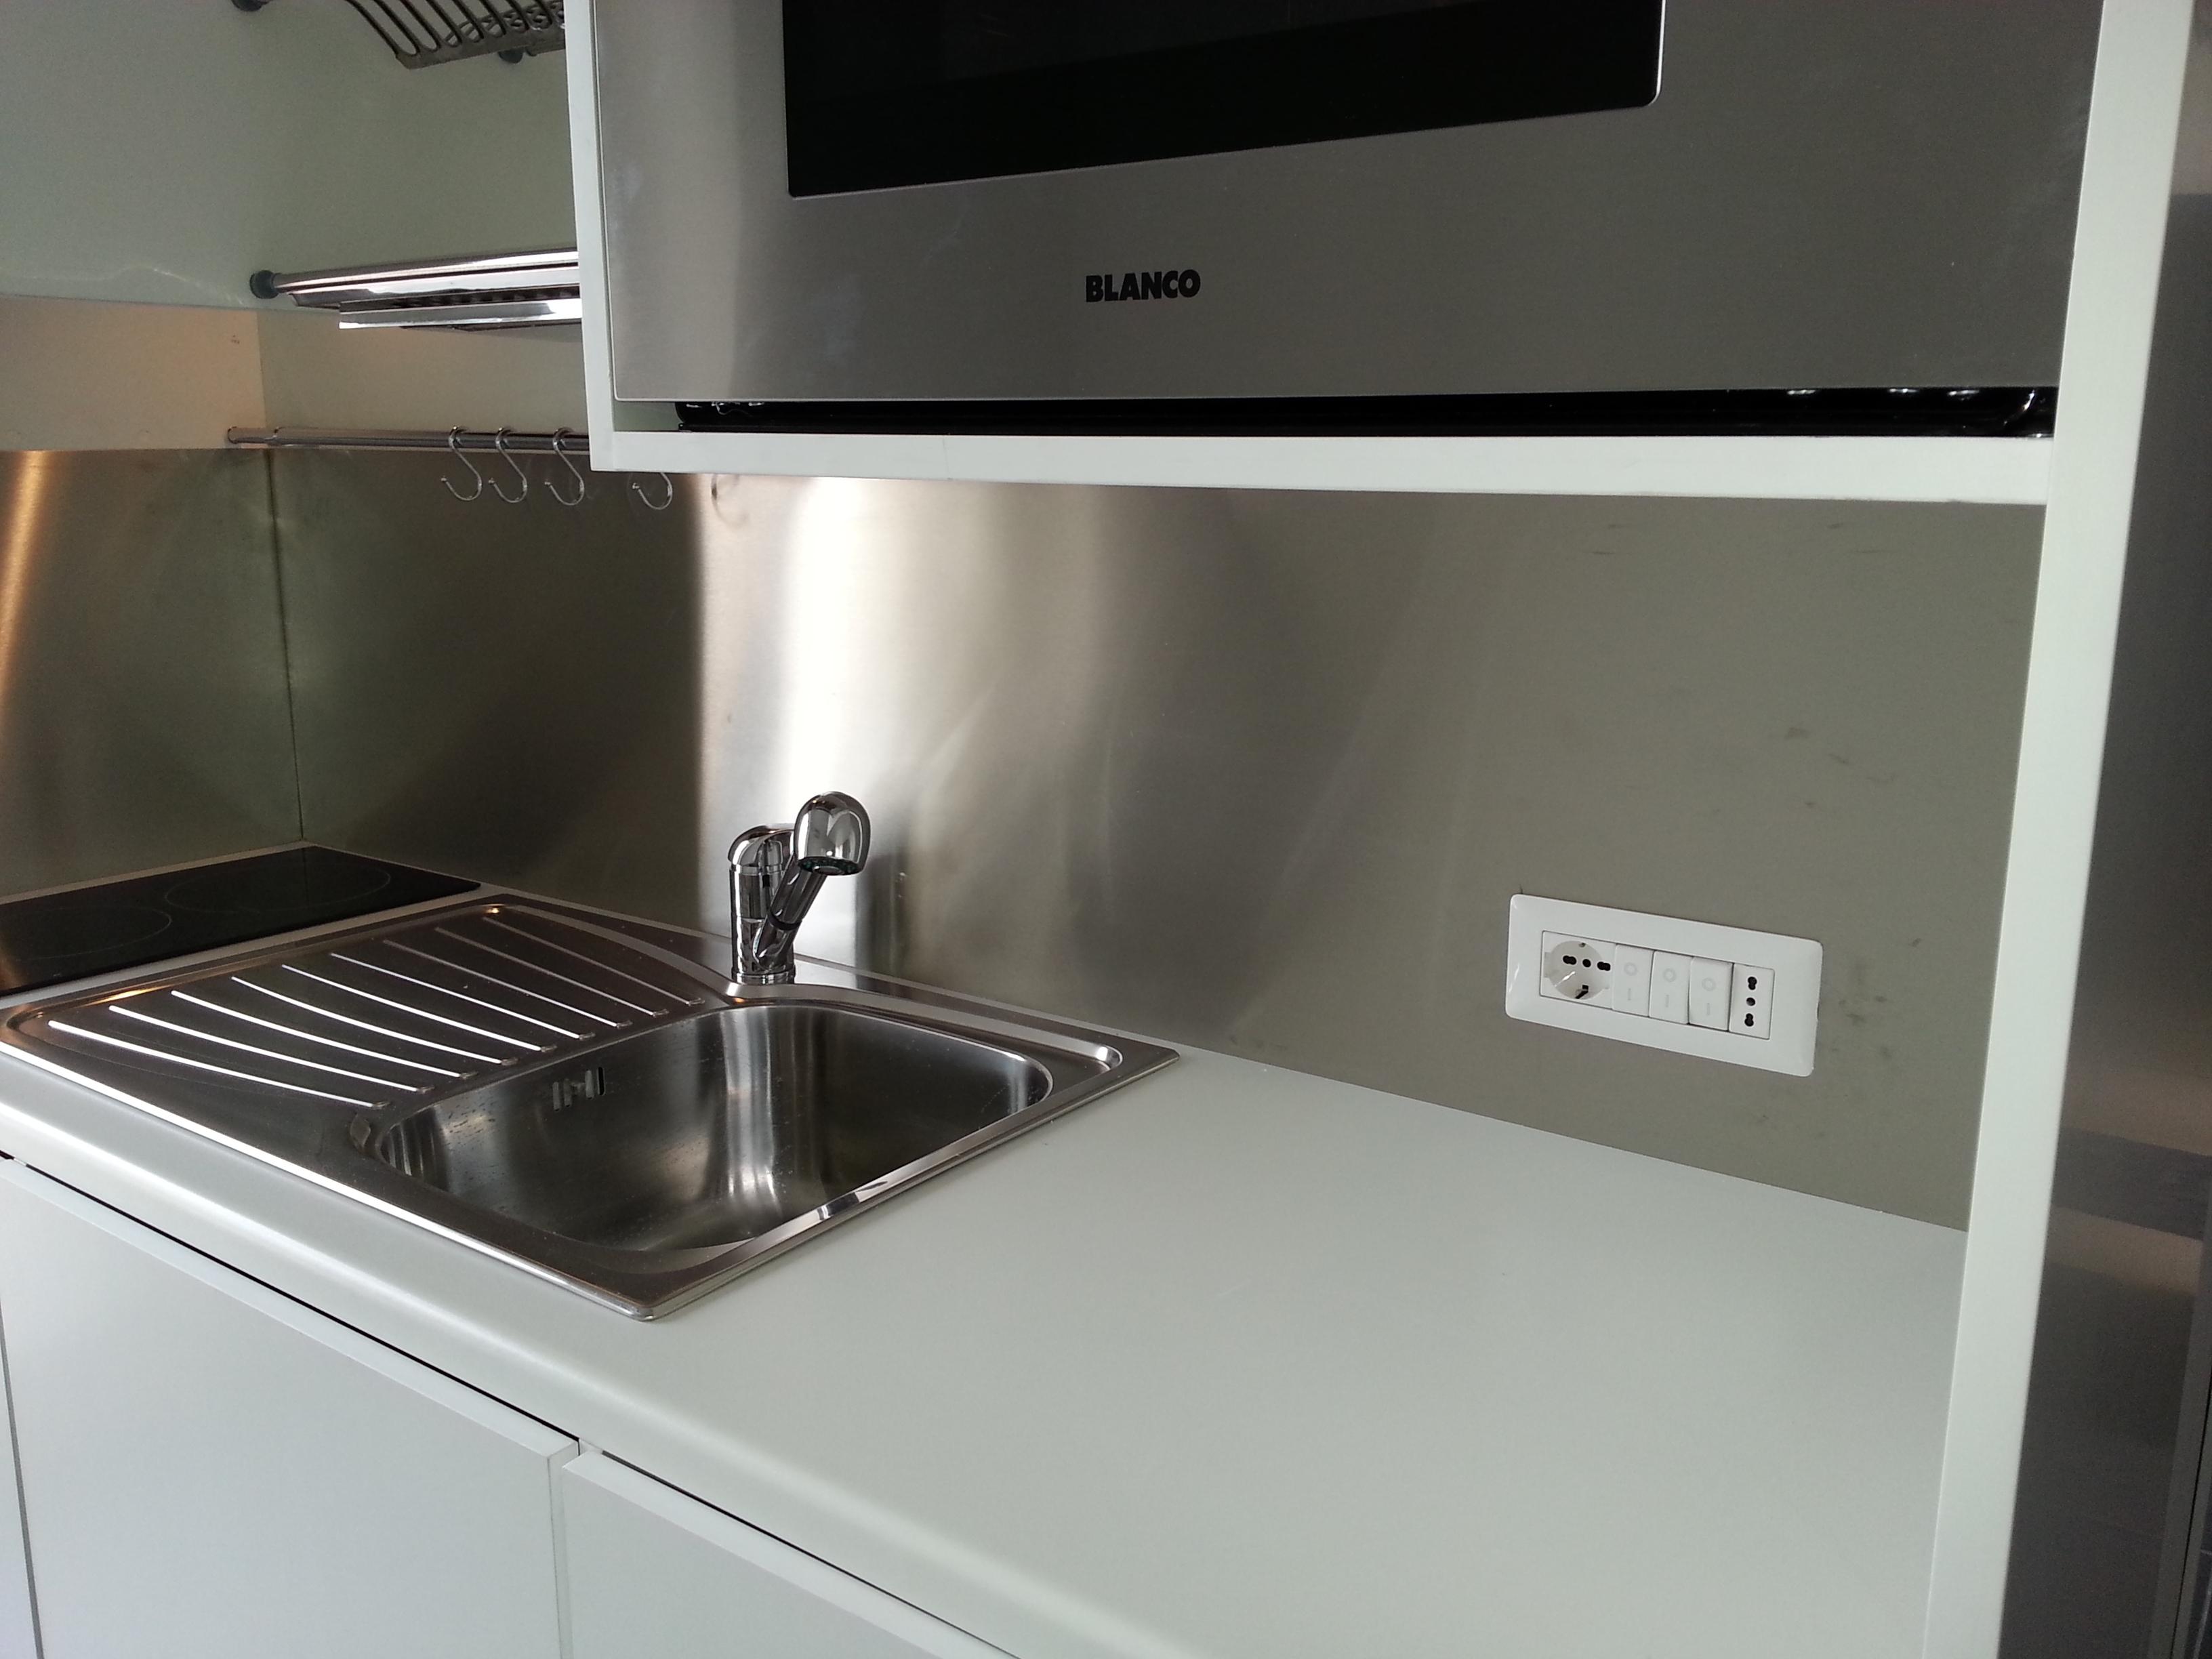 Cucina completa in armadio compact art.246 con serranda ...